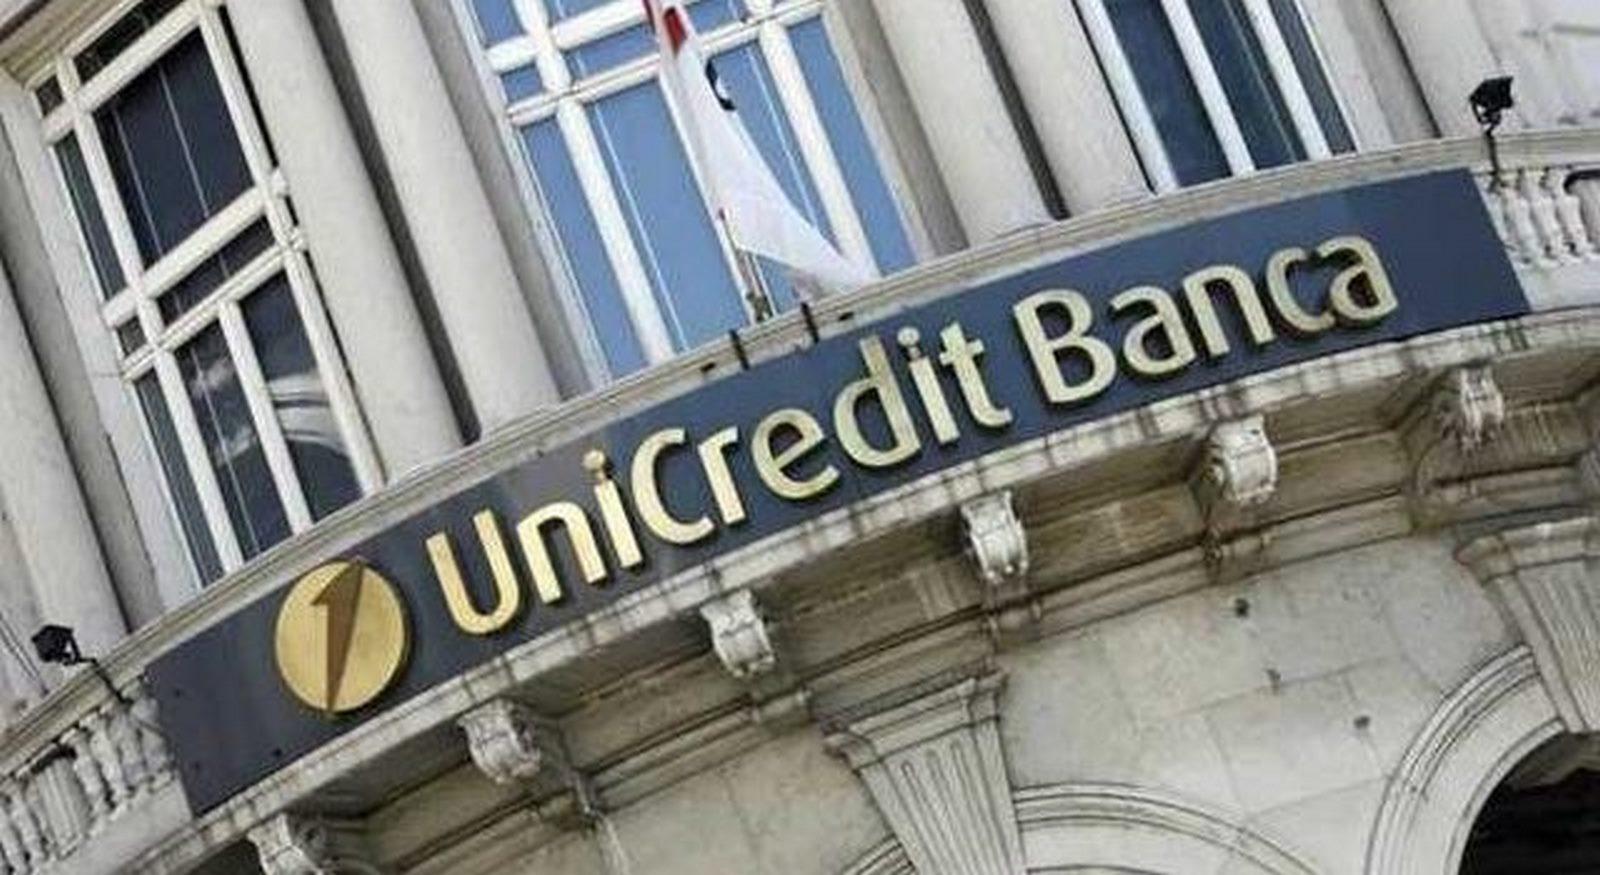 Sos: Condanna UniCredit